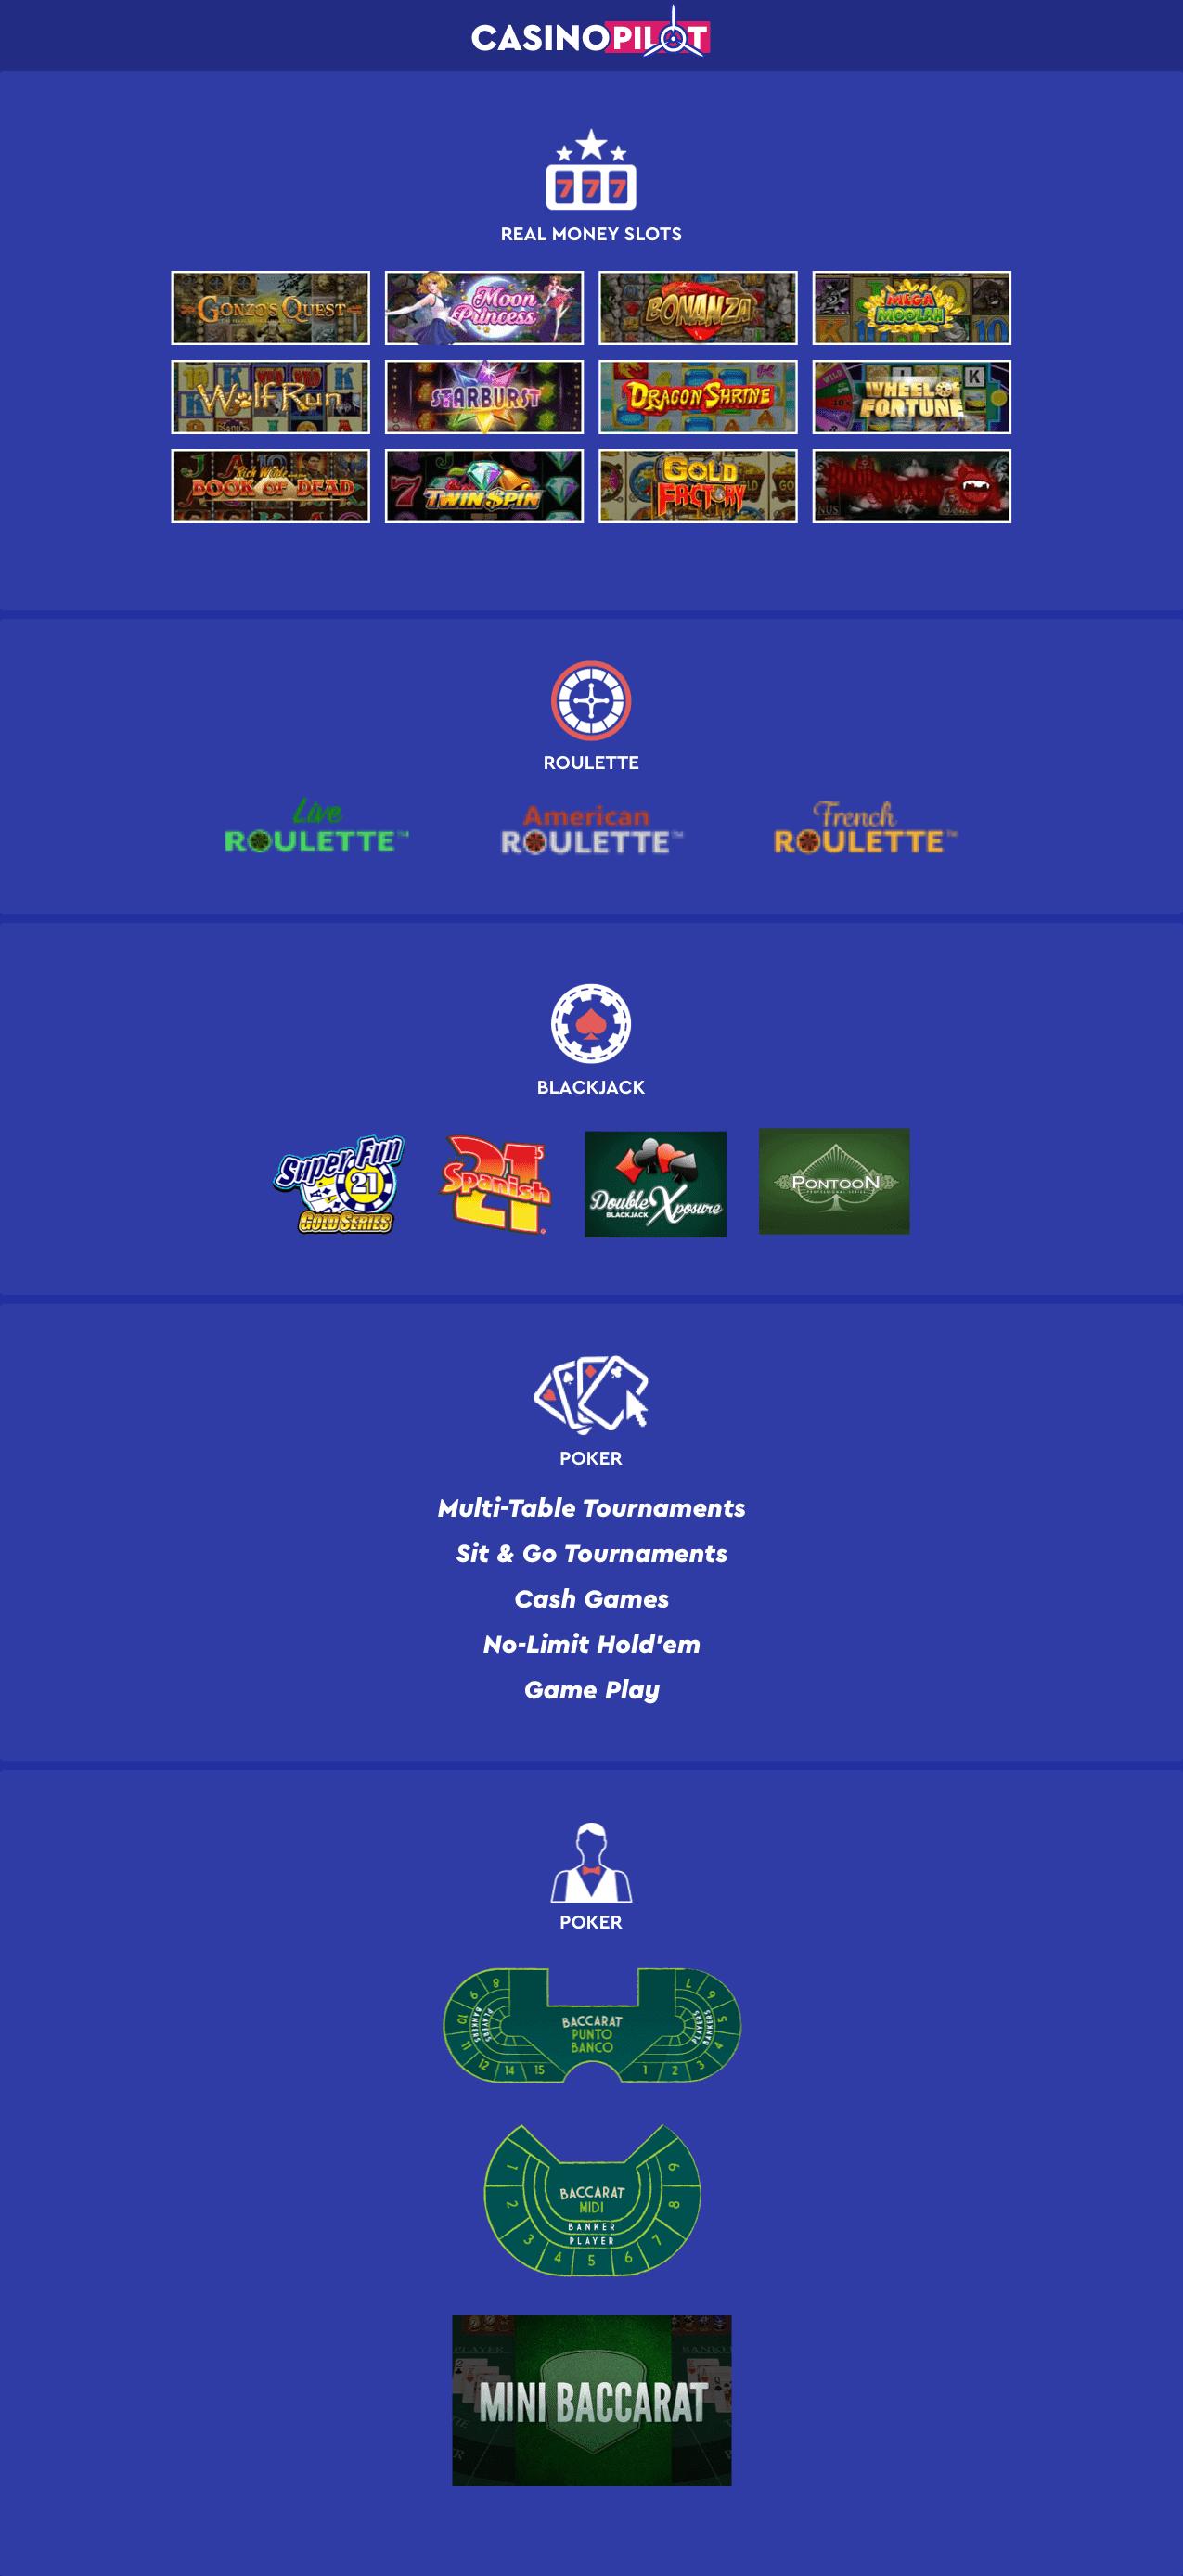 Games at real money casinos